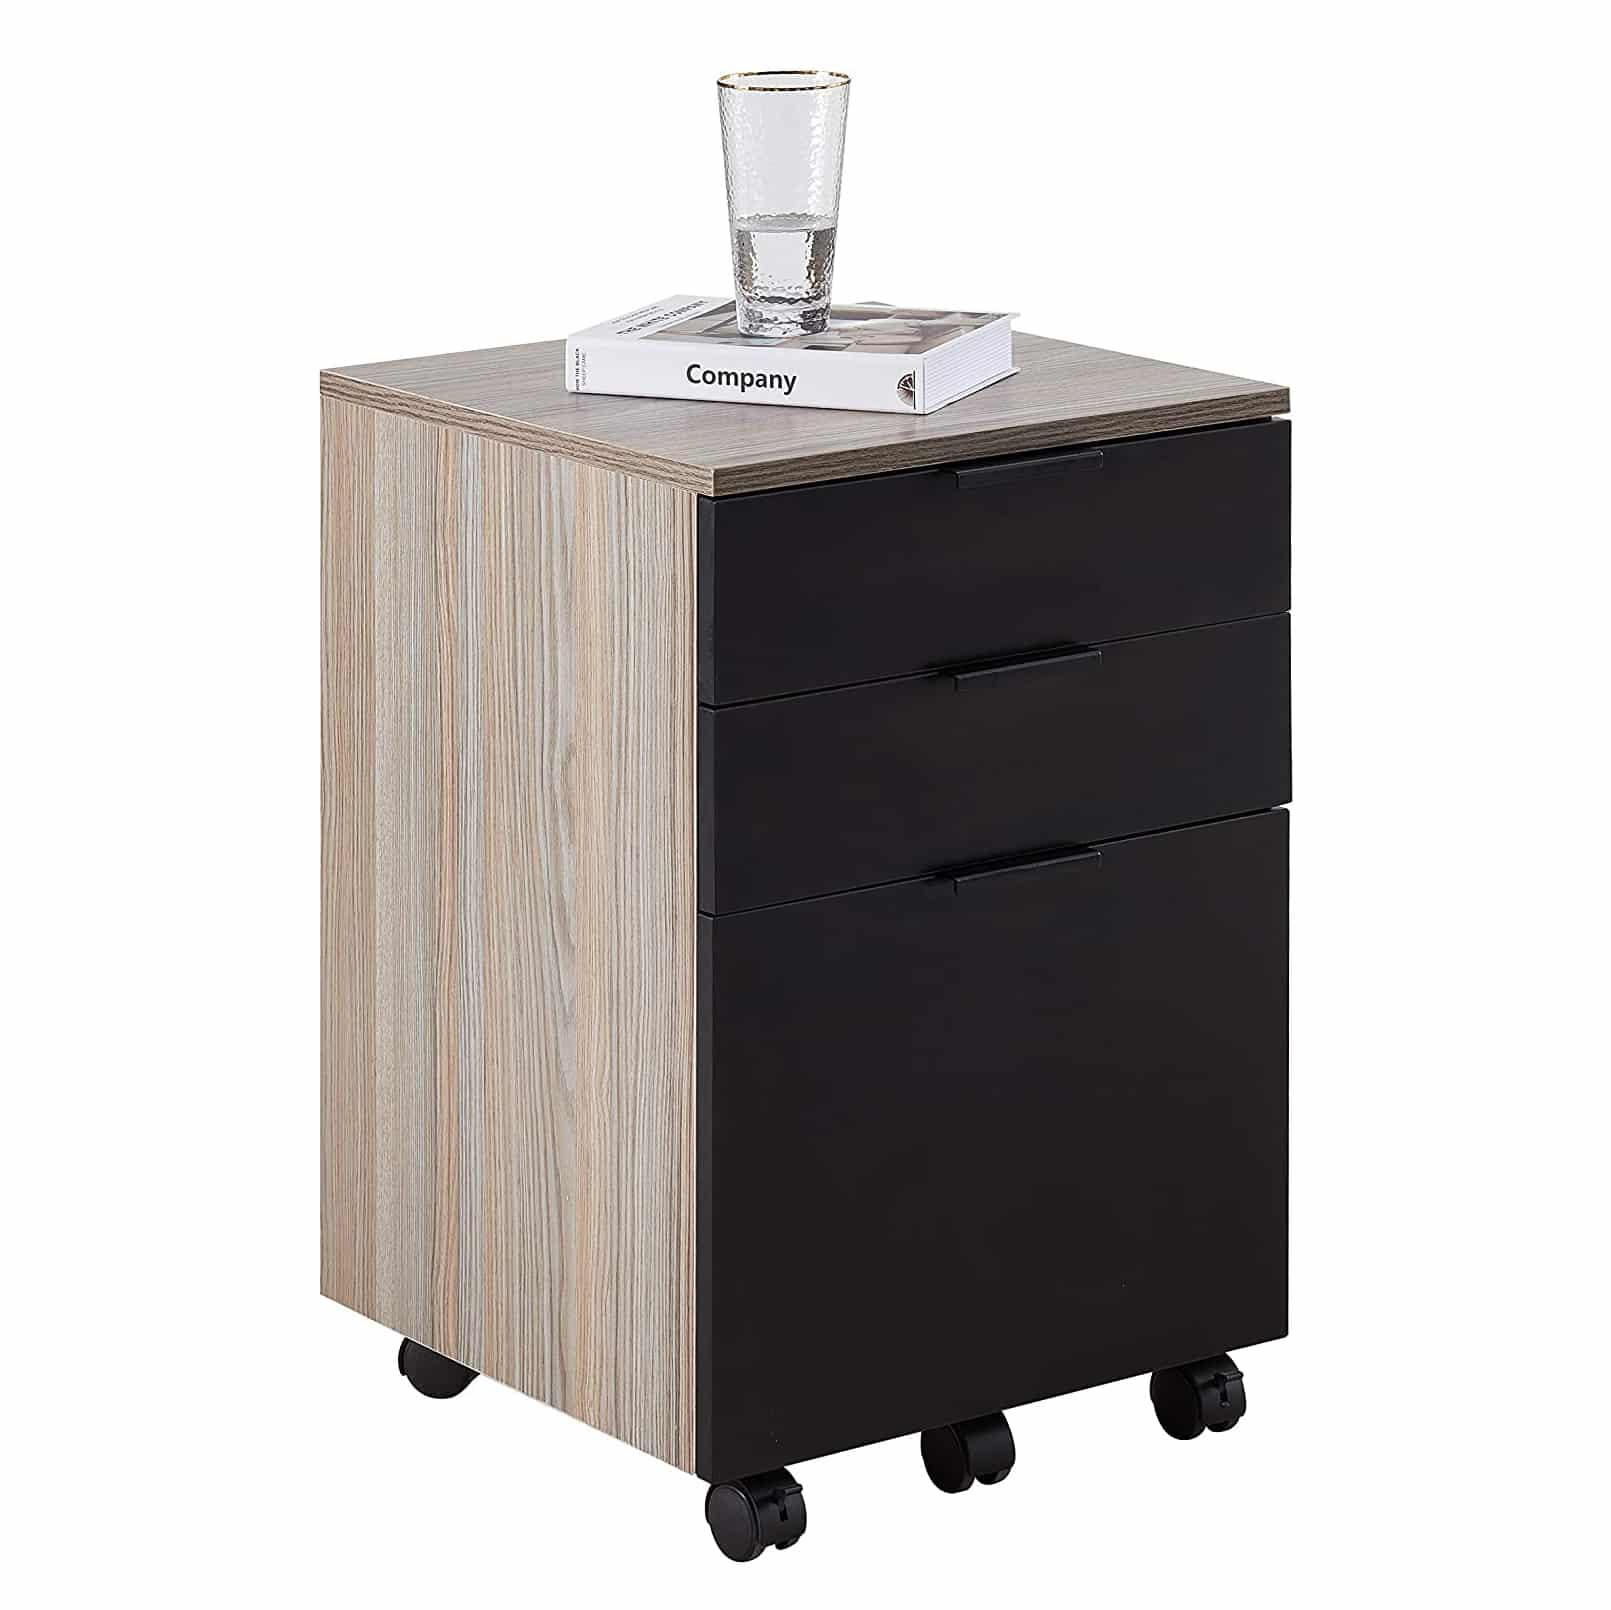 JJS 3 Drawer Wood Rolling File Cabinet